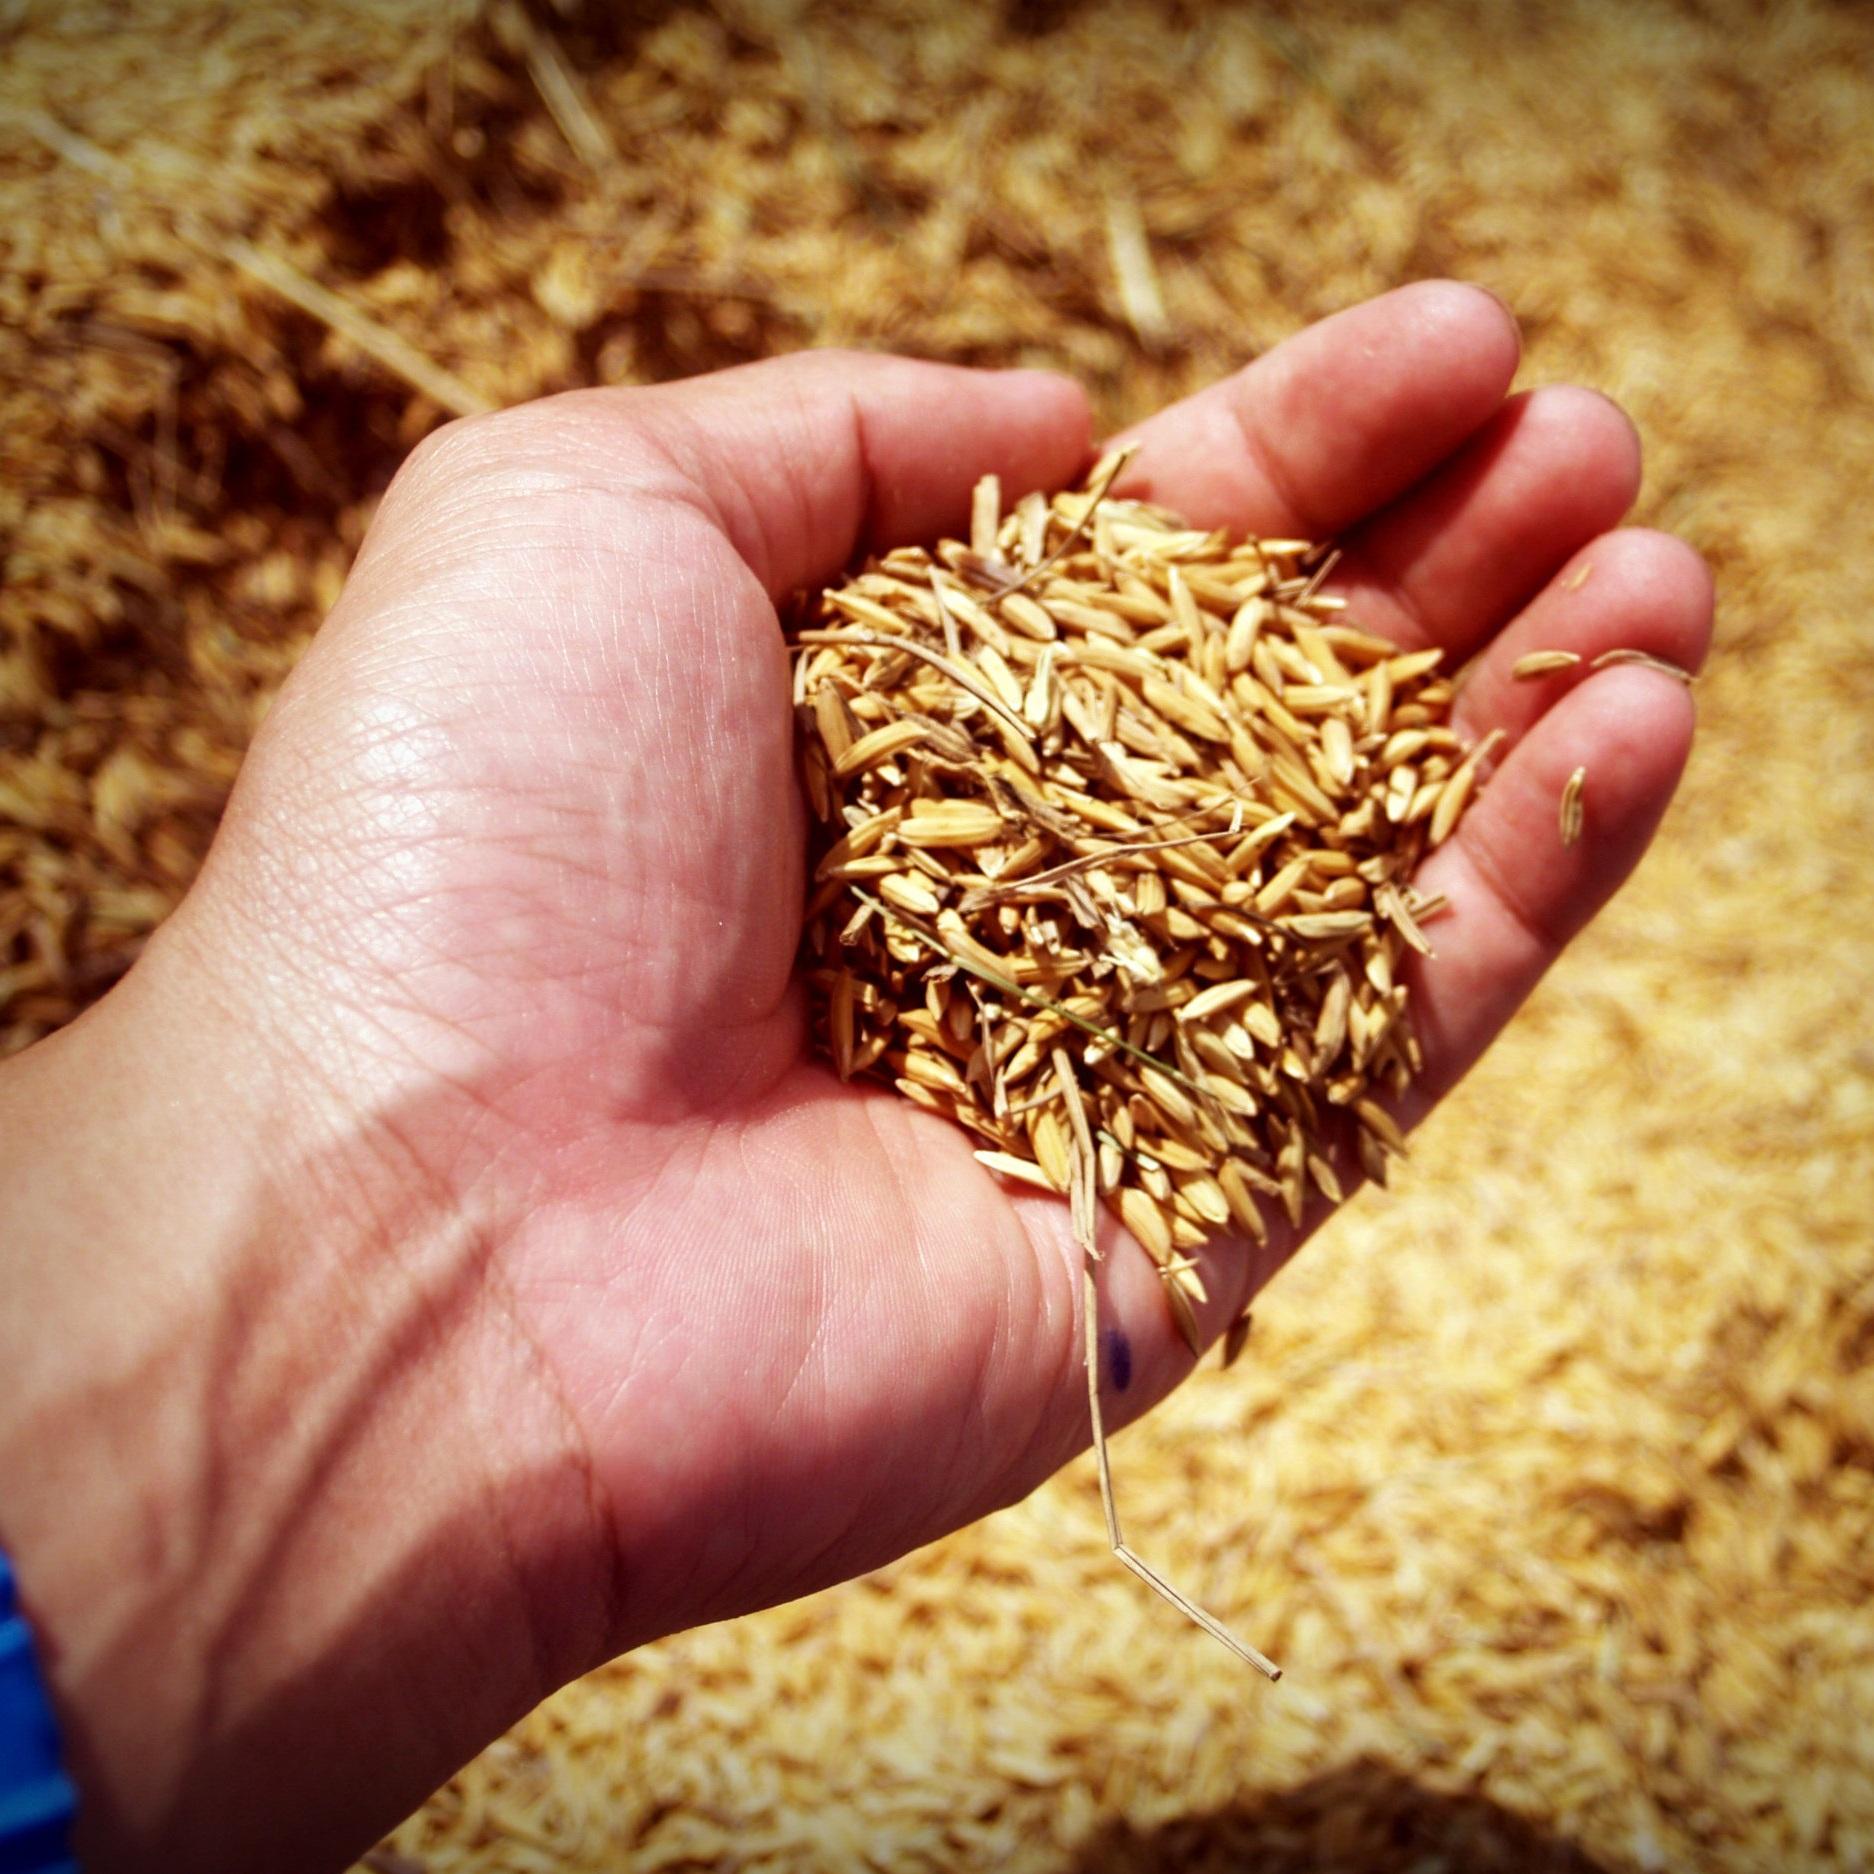 Canva+-+Jasmine+Rice+Seed+Farmer+Hand.jpg